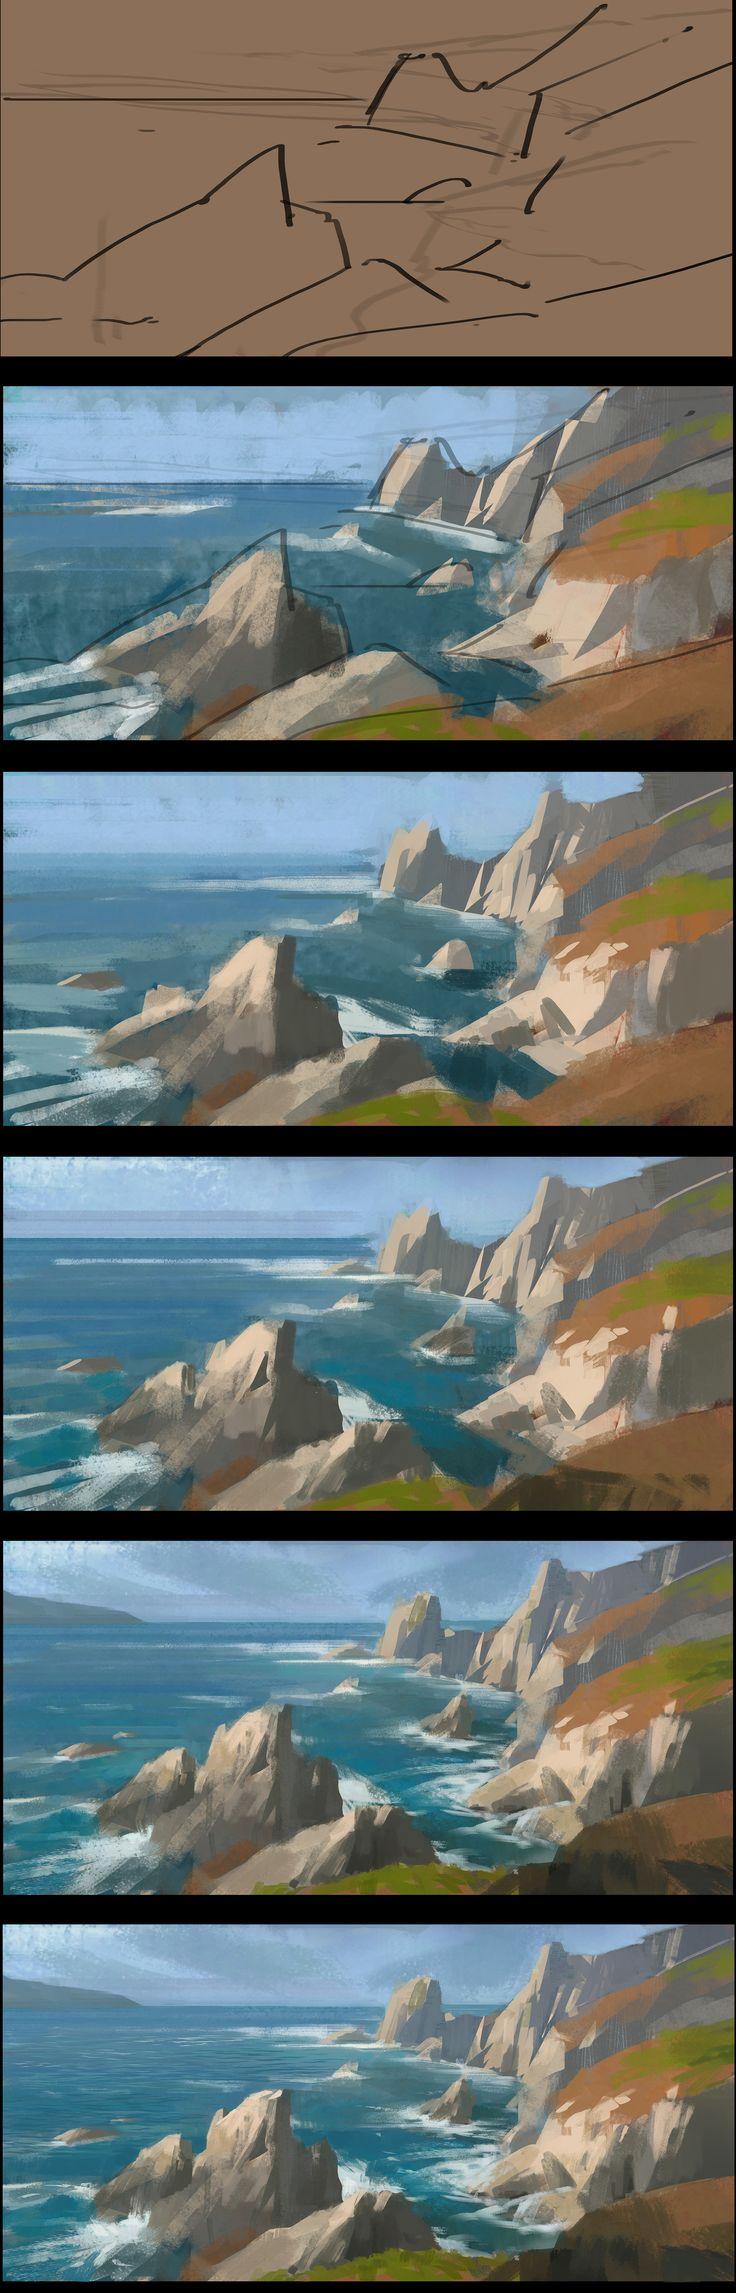 ArtStation - Three landscape Paintings and process share, Dawnpu at Art vision studio